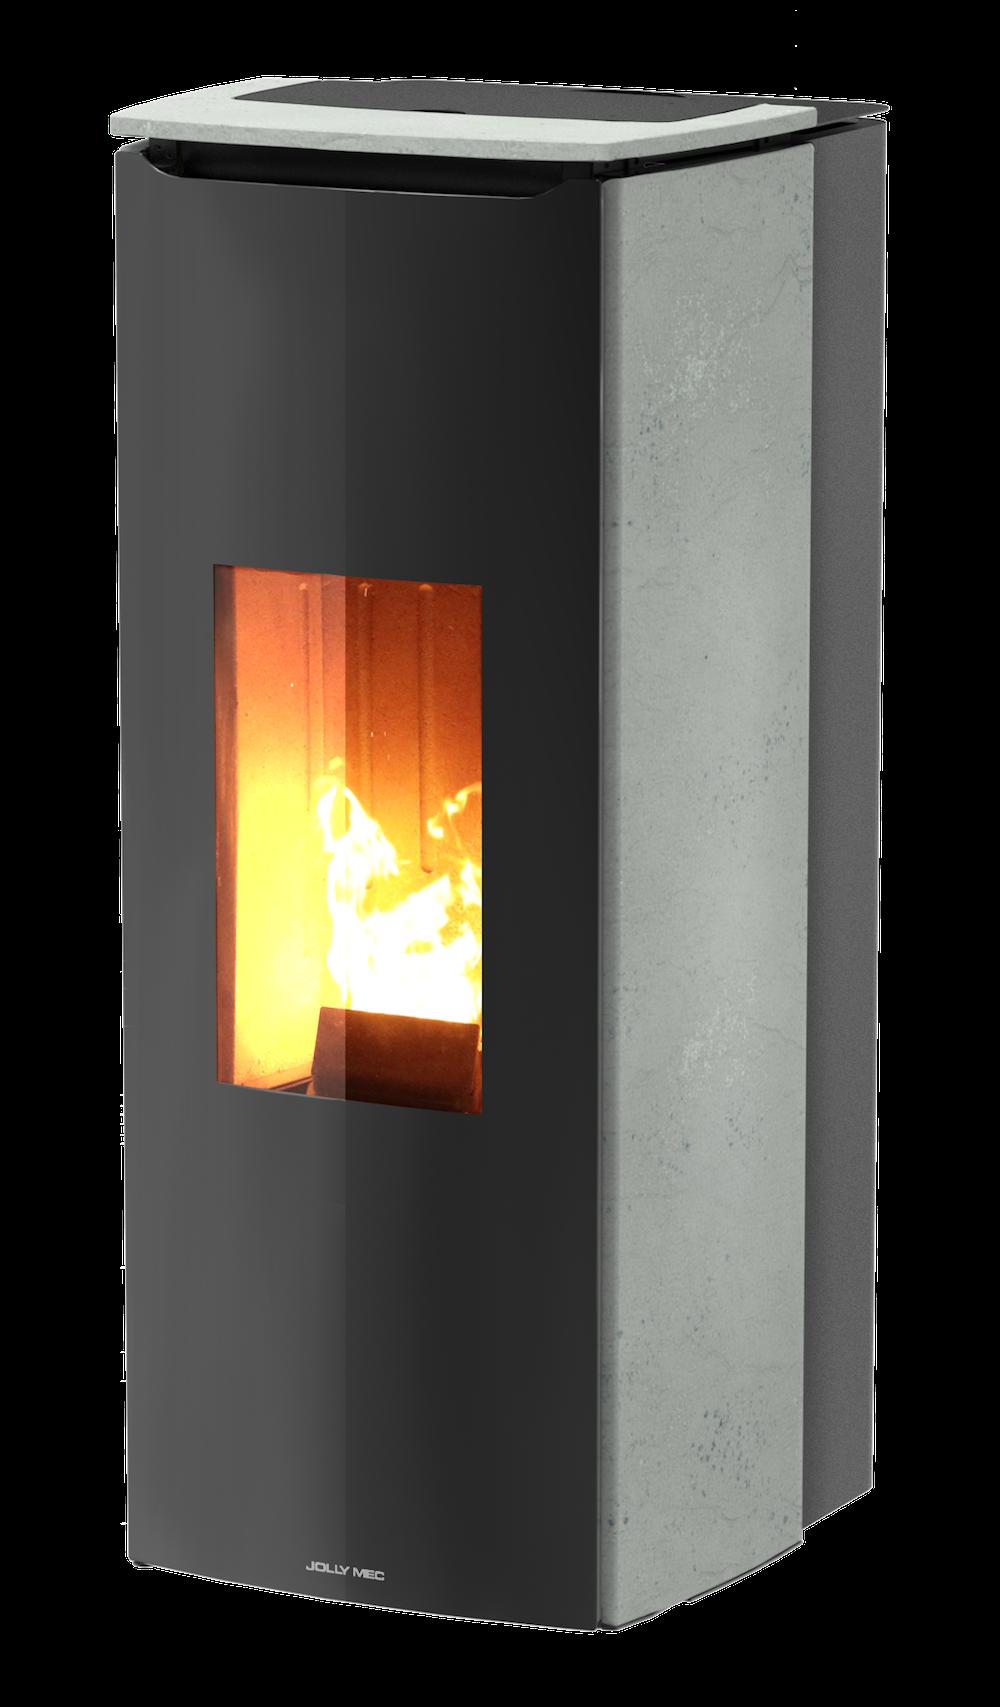 eco2all jolly mec odette pelletkachel product in beeld. Black Bedroom Furniture Sets. Home Design Ideas